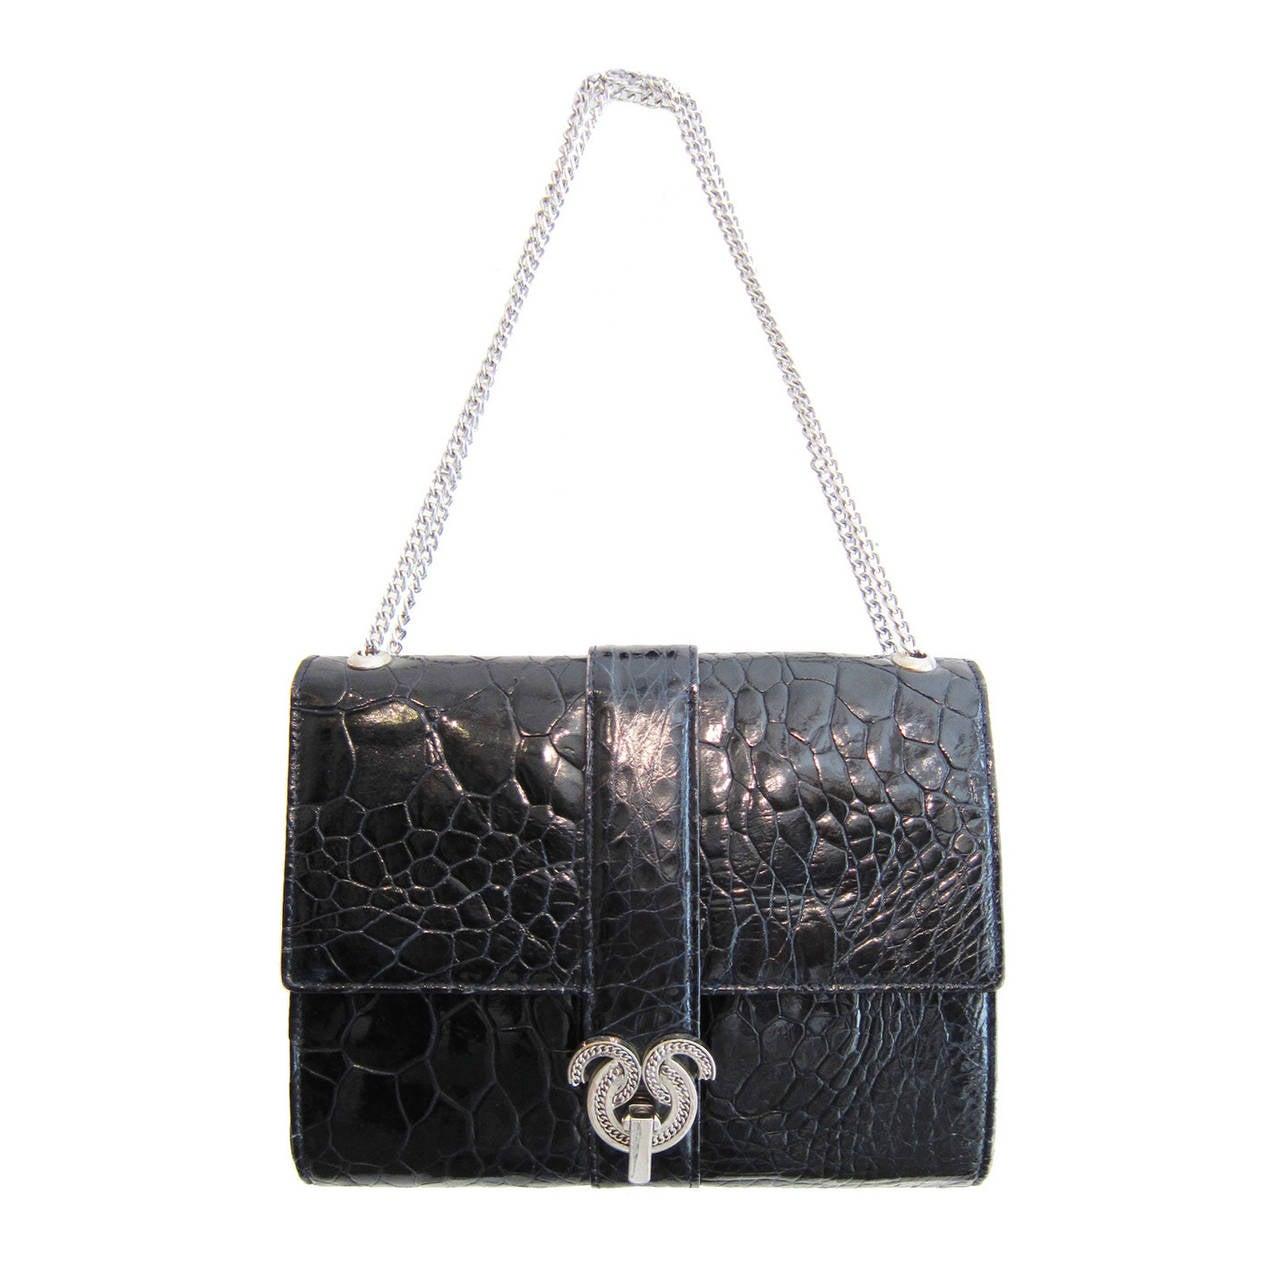 Modell Royal Black Crocodile Shoulder Chain Bag 1960's